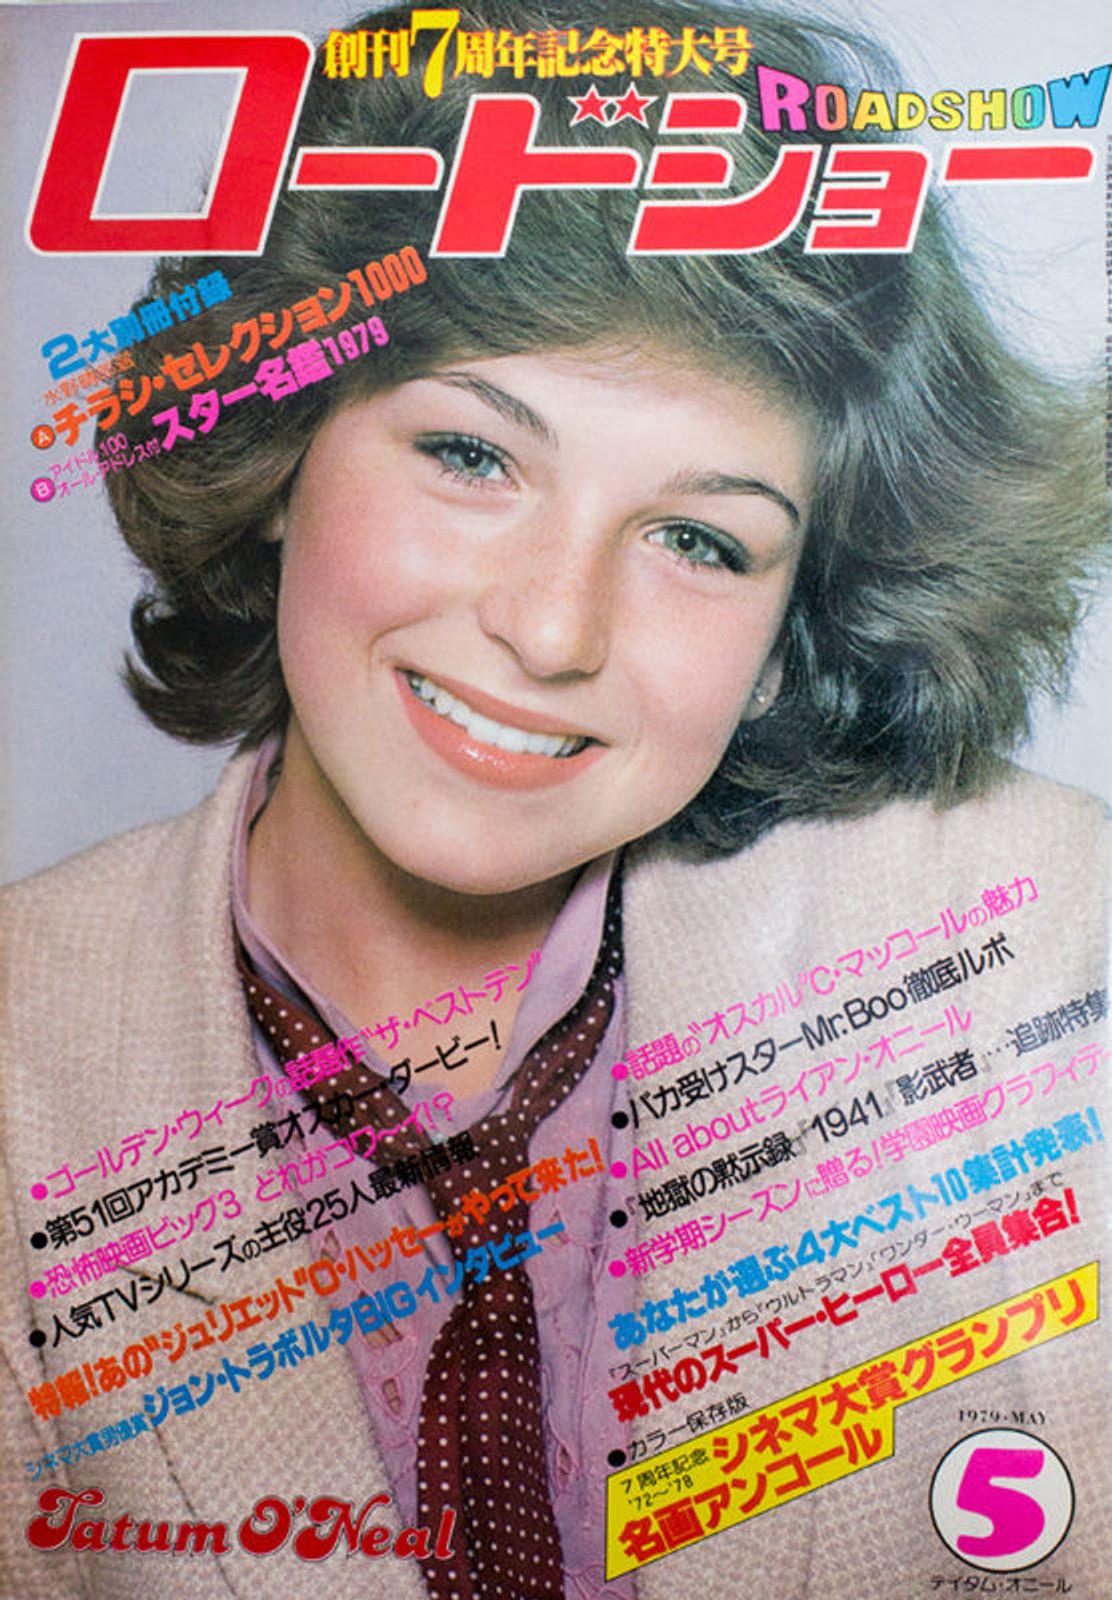 ROADSHOW 05/1979 JapanMovie Magazine TATUM O'NEAL/OLIVIA HUSSEY/CATRIONA MACCOLL